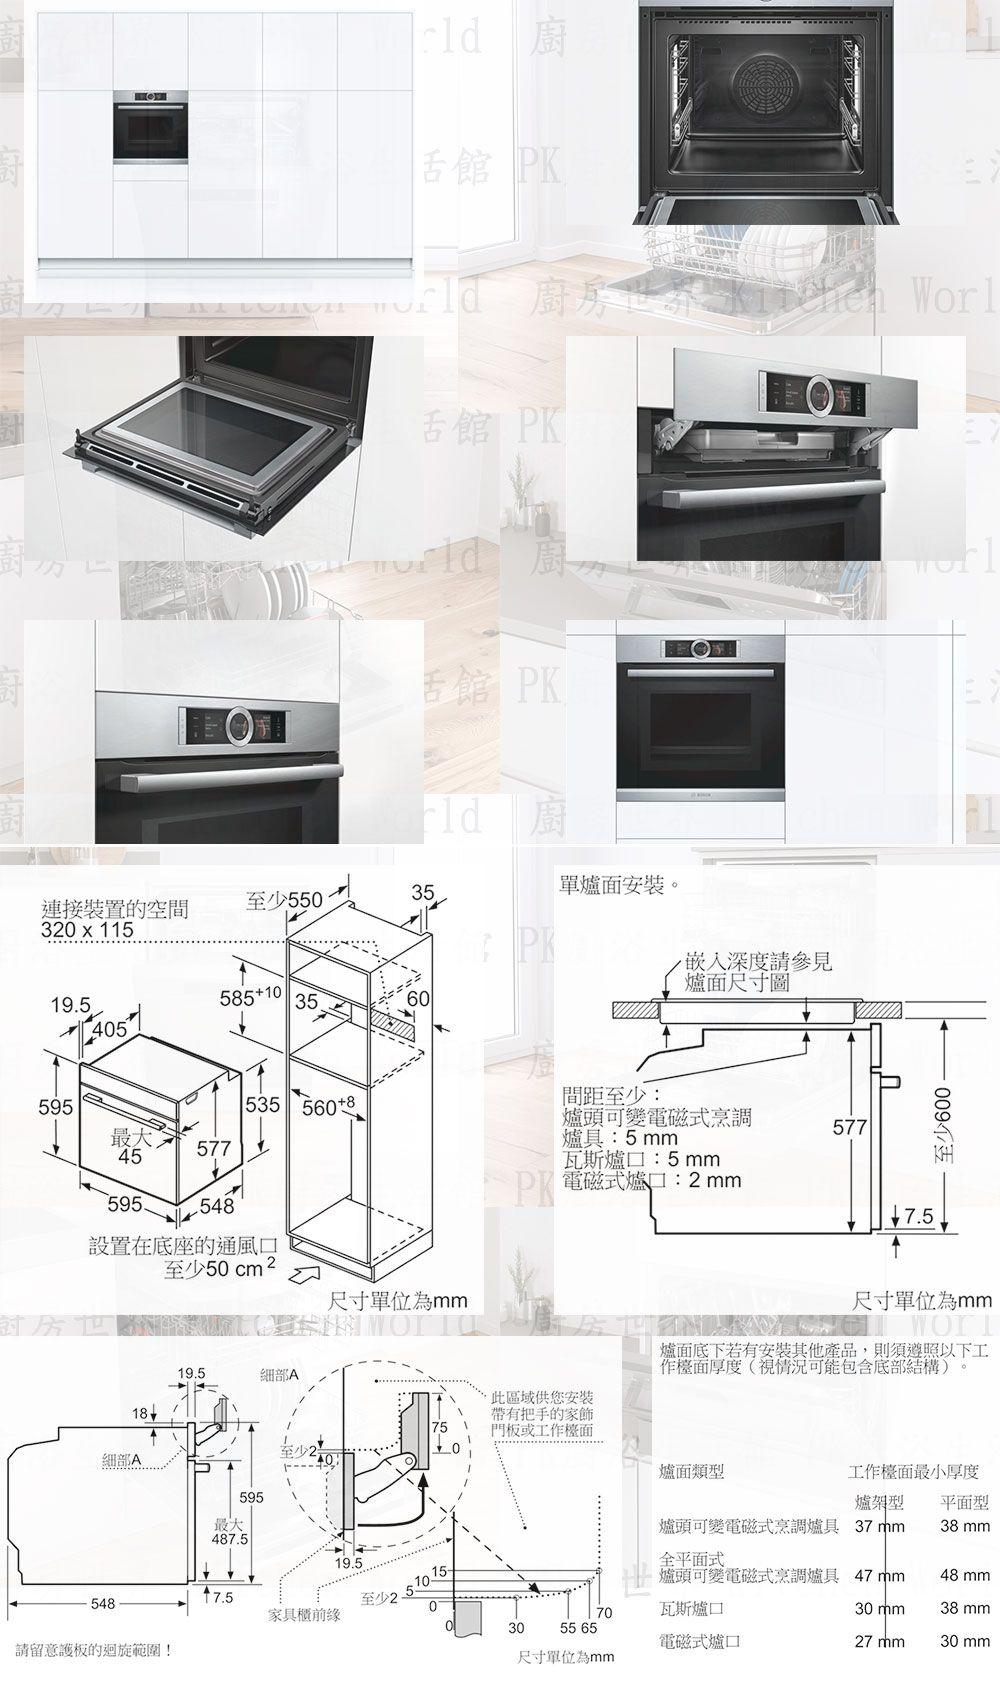 PK/goods/BOSCH/Oven/HNG6764S1-DM-1.jpg